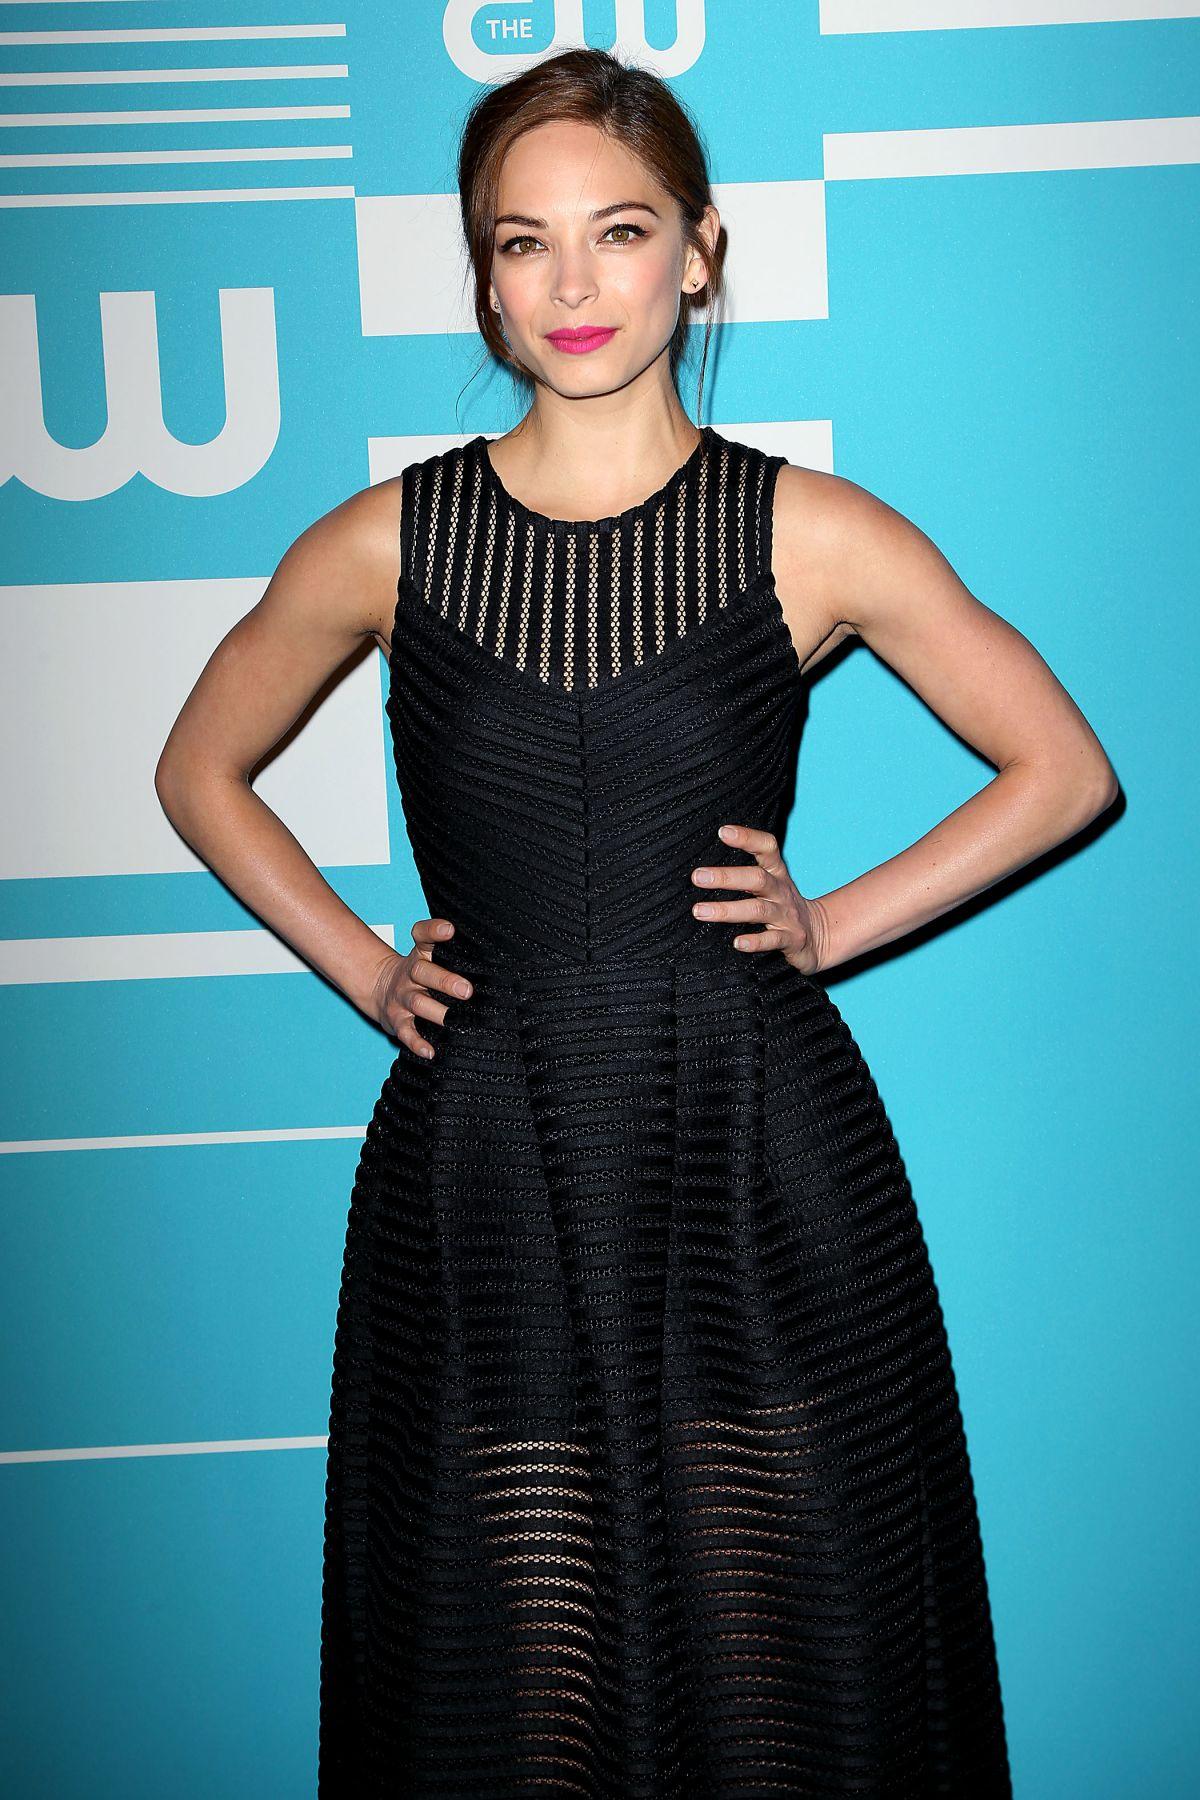 KRISTIN KREUK at CW Network's 2015 Upfront in New York